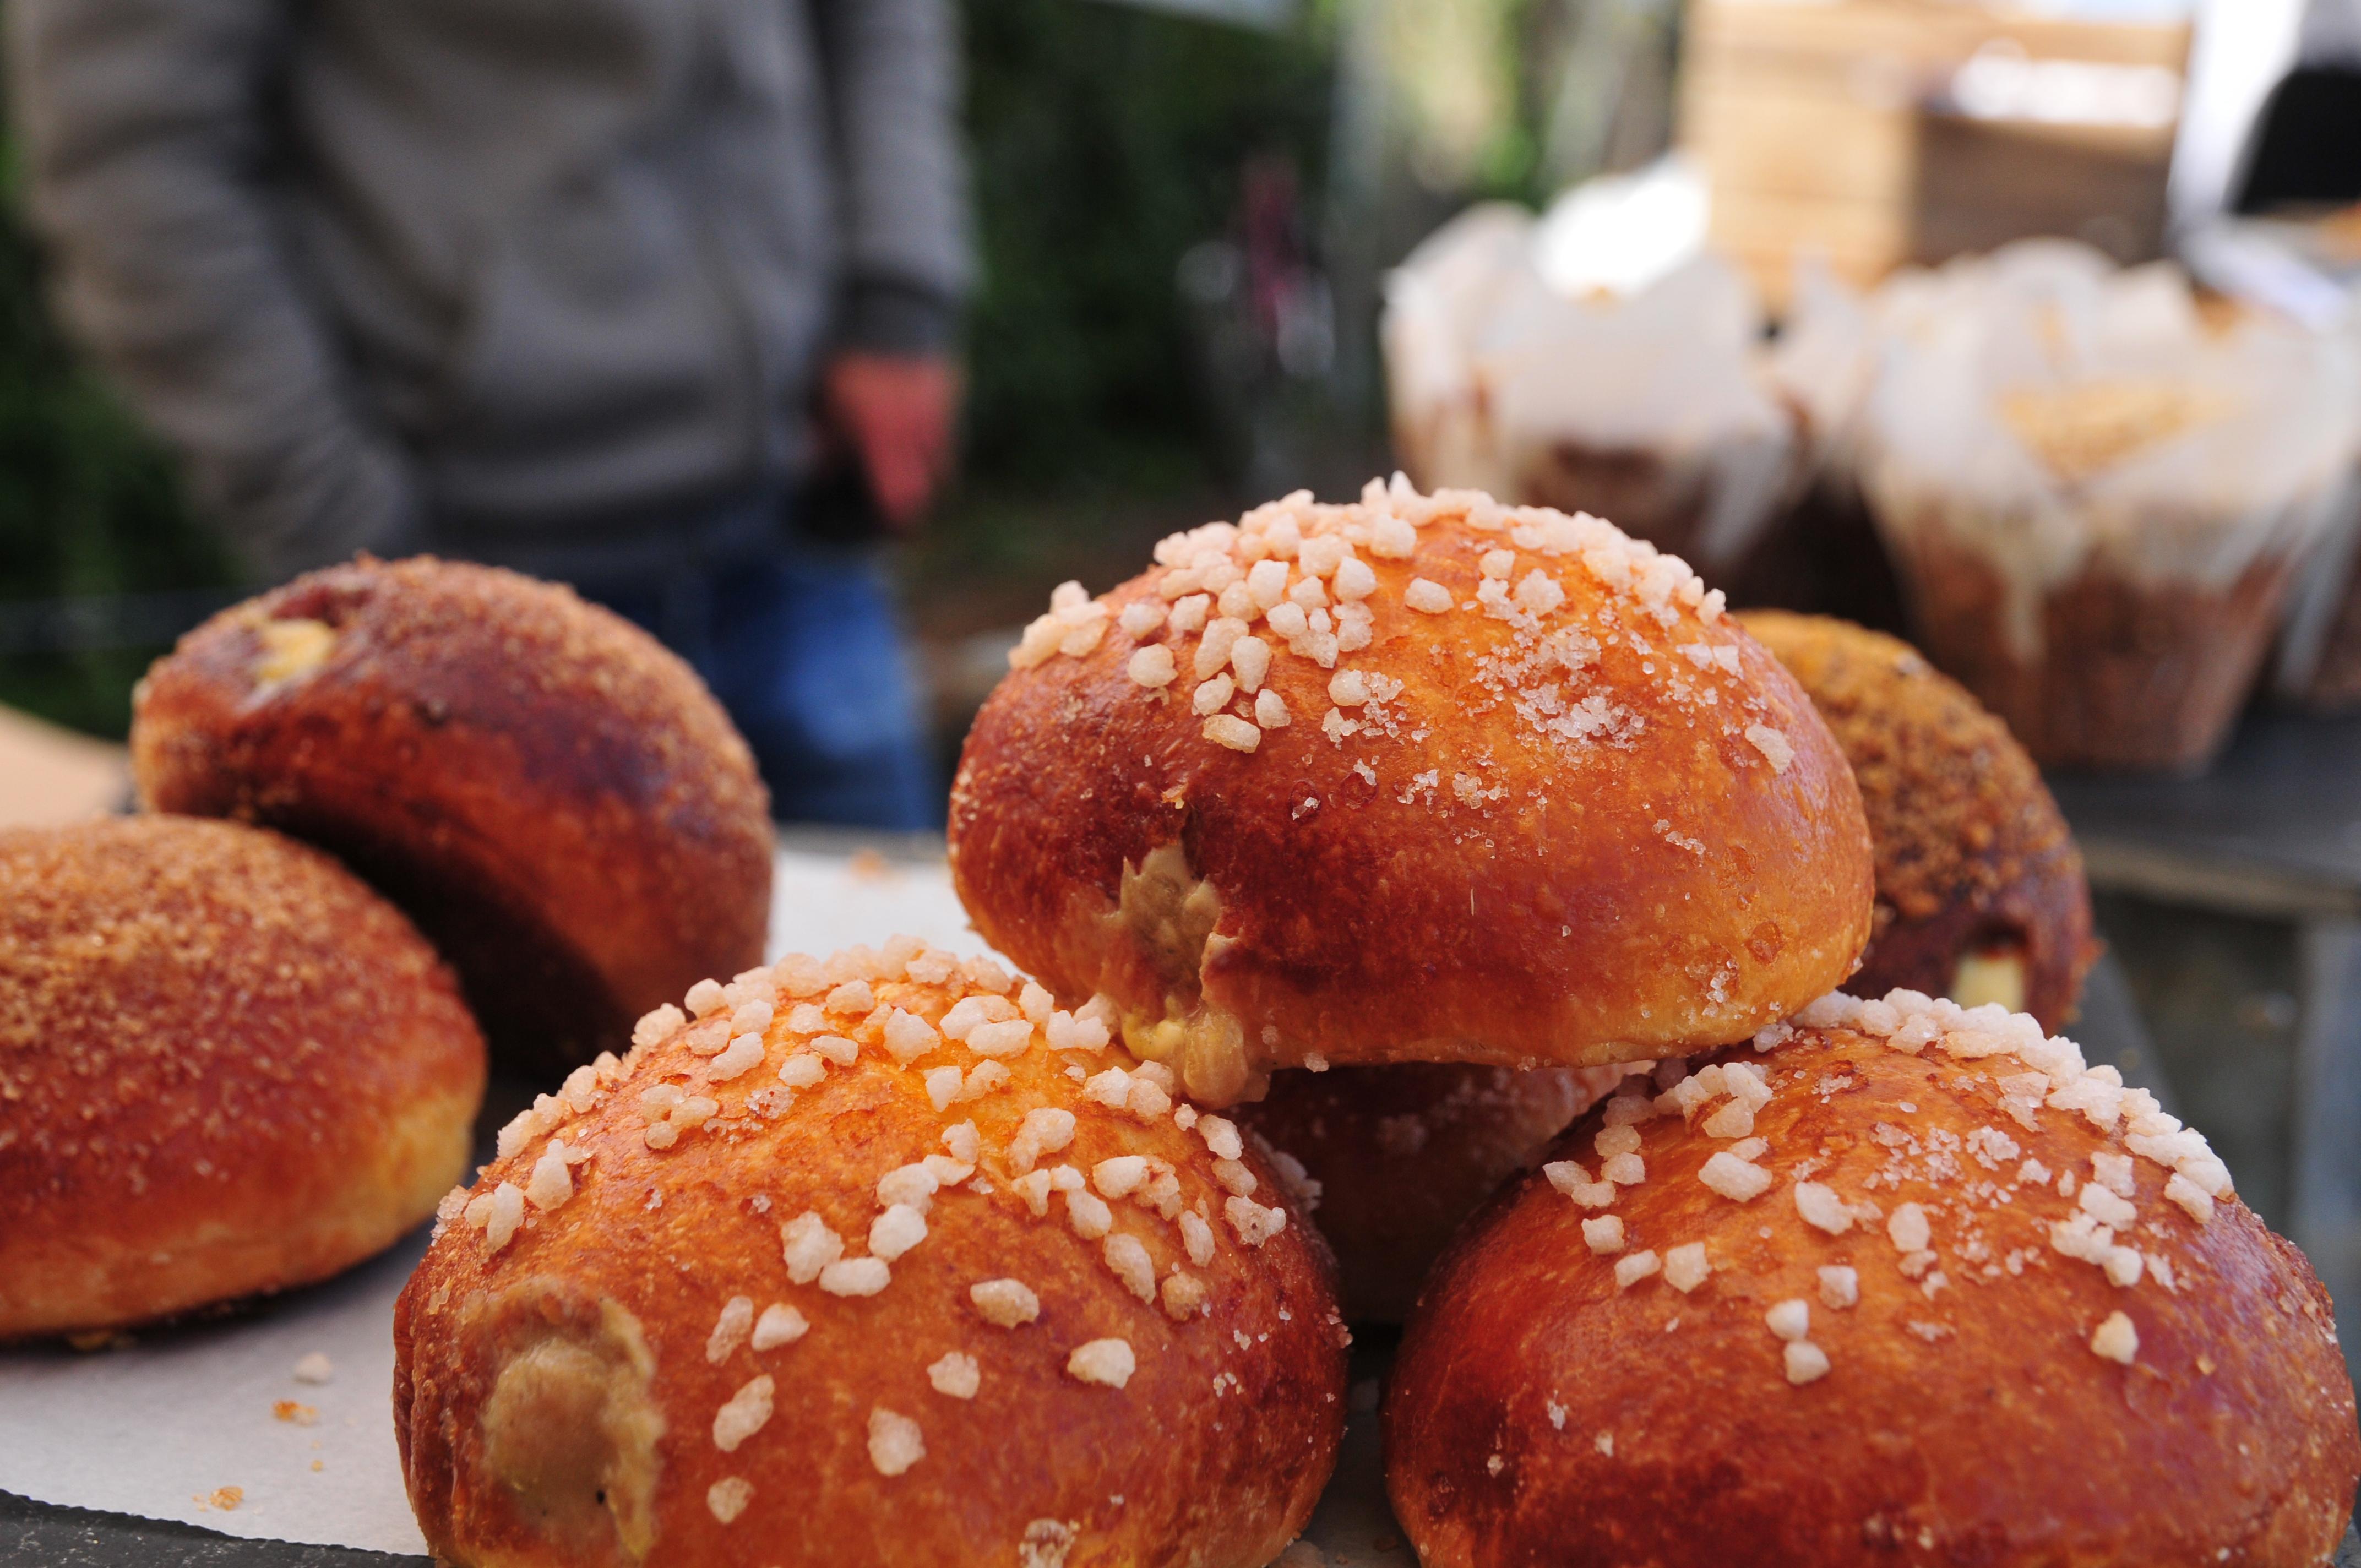 Breadren